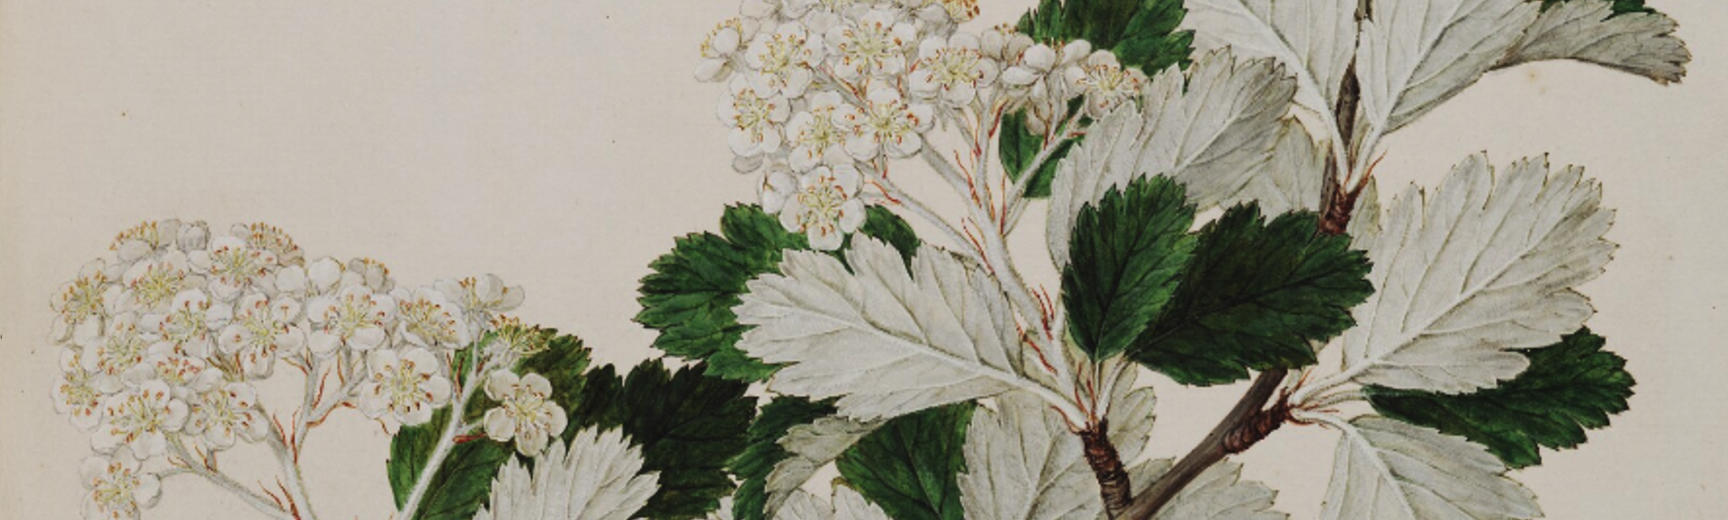 1780x520 plant